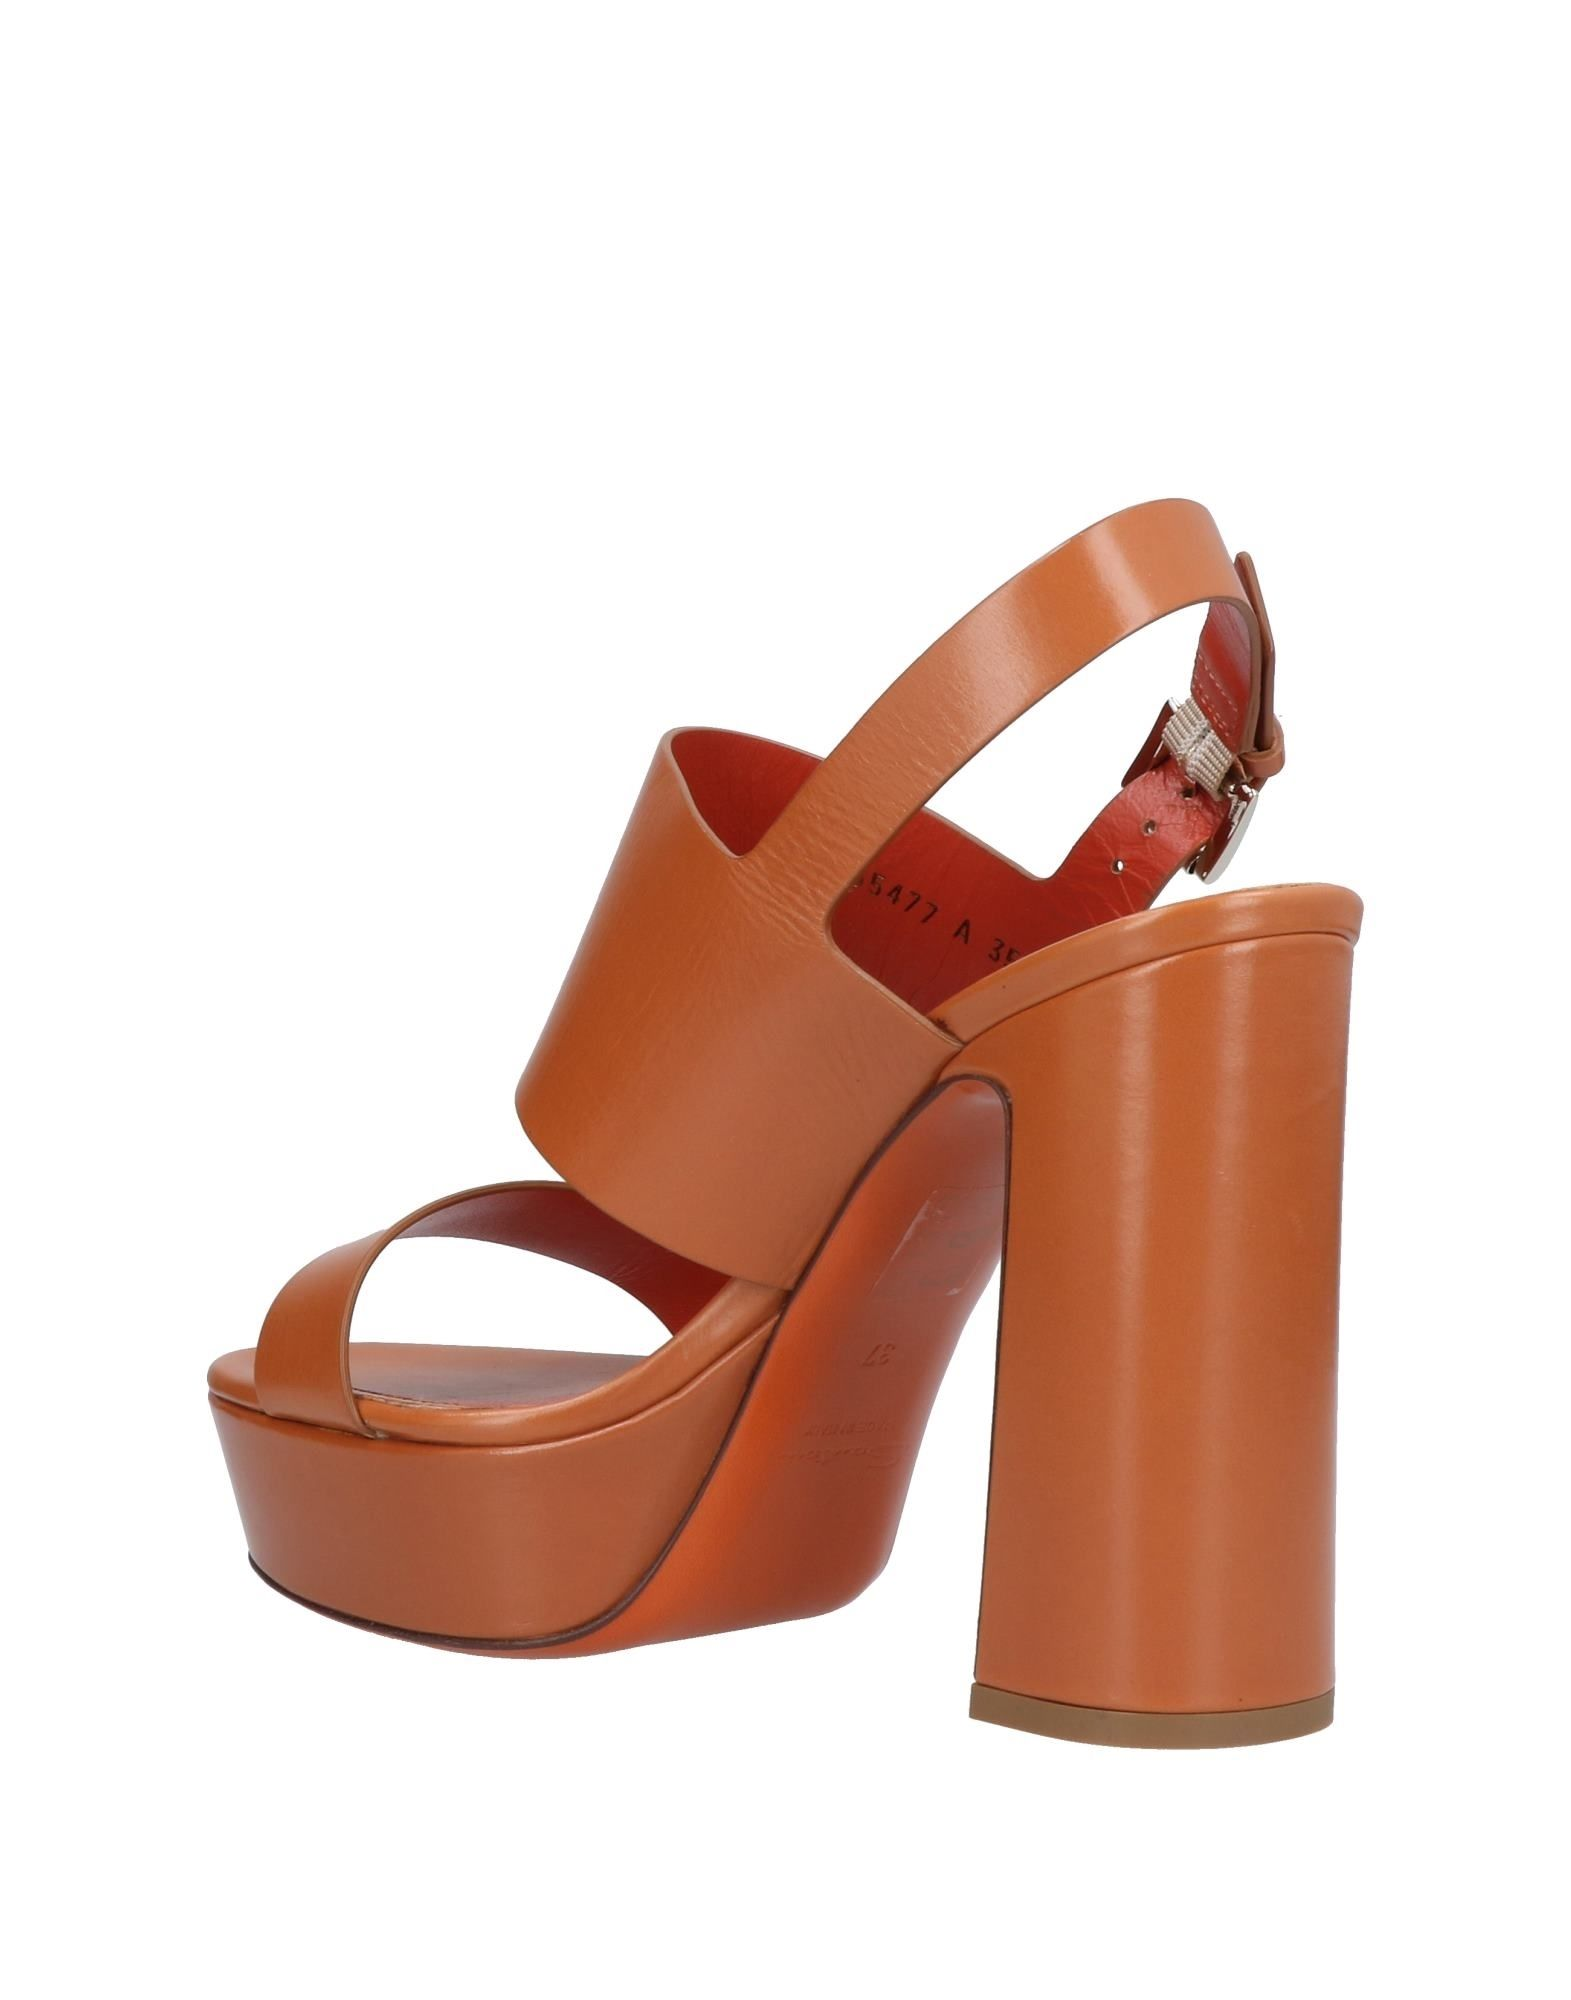 Santoni Sandalen Damen Schuhe  11387706RRGut aussehende strapazierfähige Schuhe Damen 4a3e94